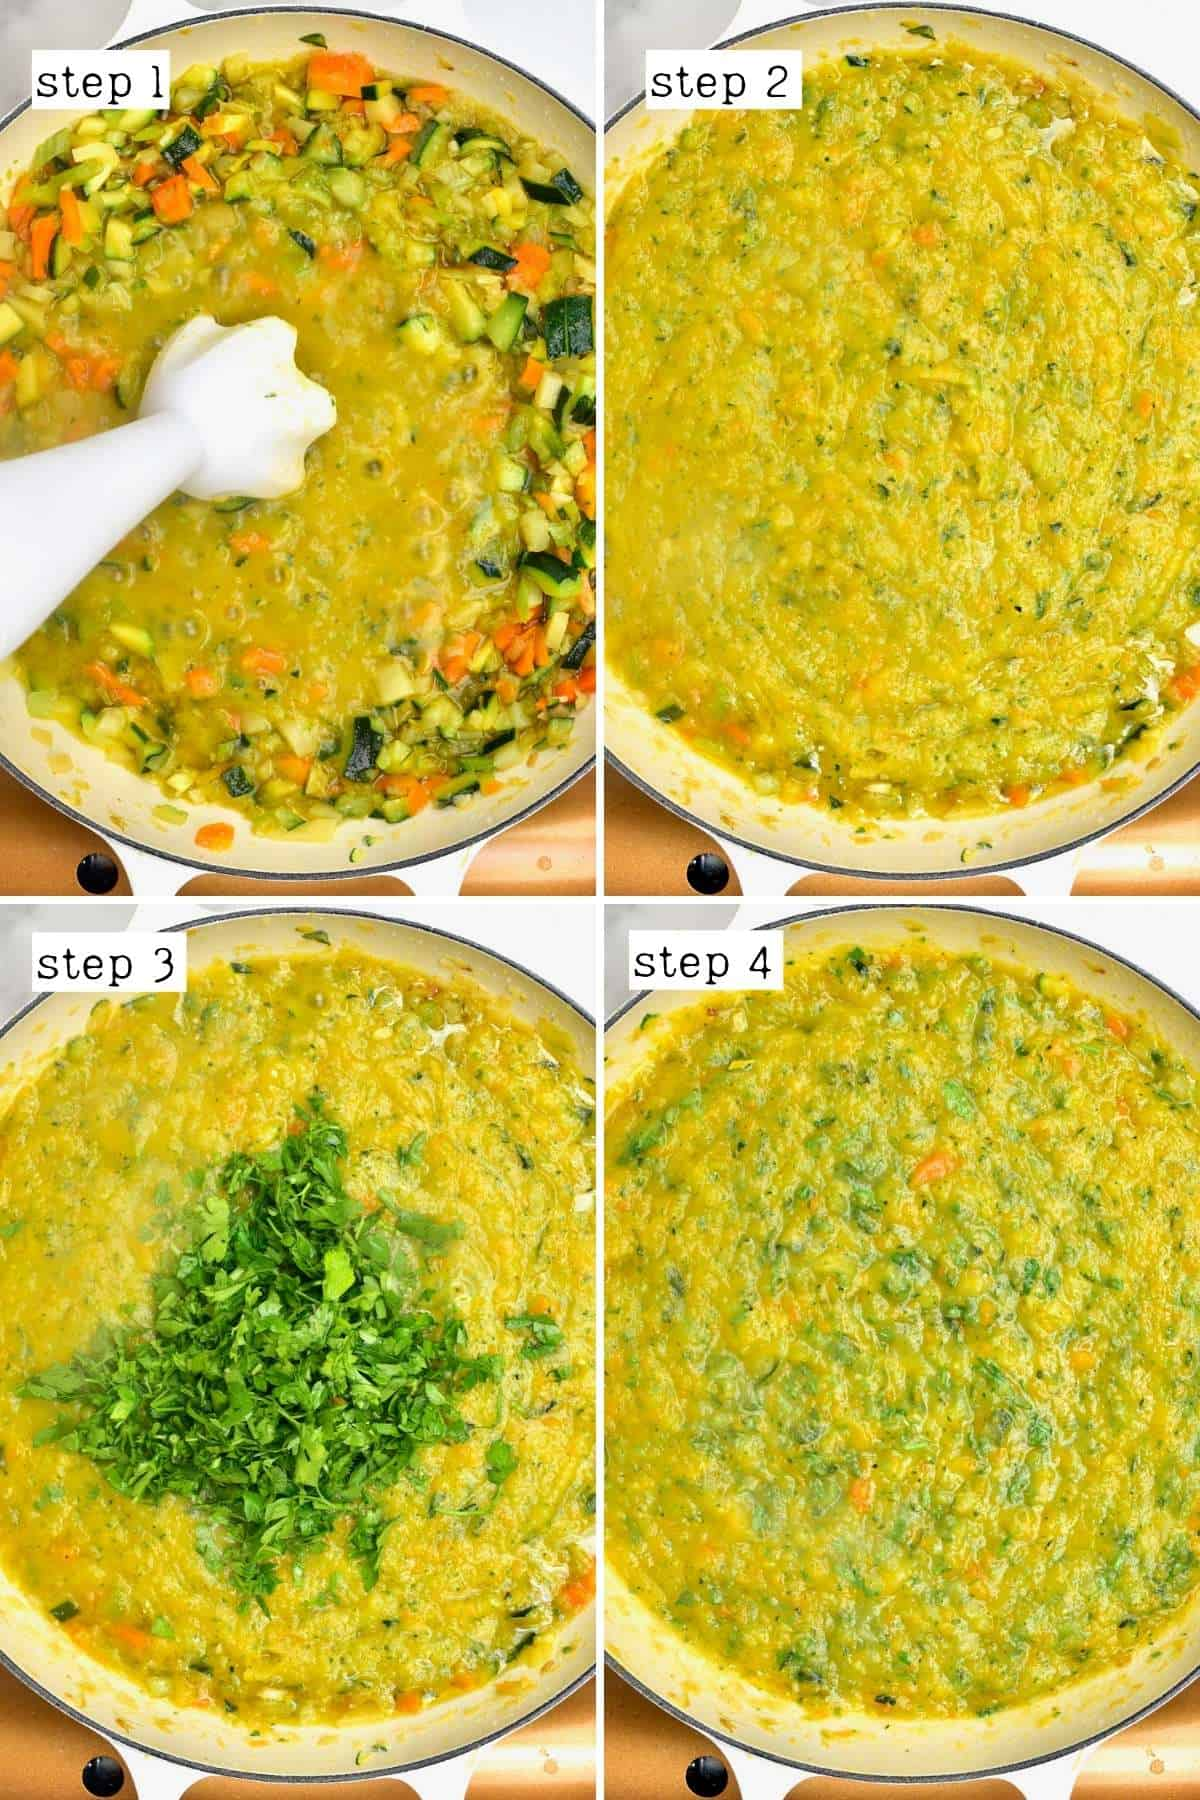 Steps for making vegetable stock puree